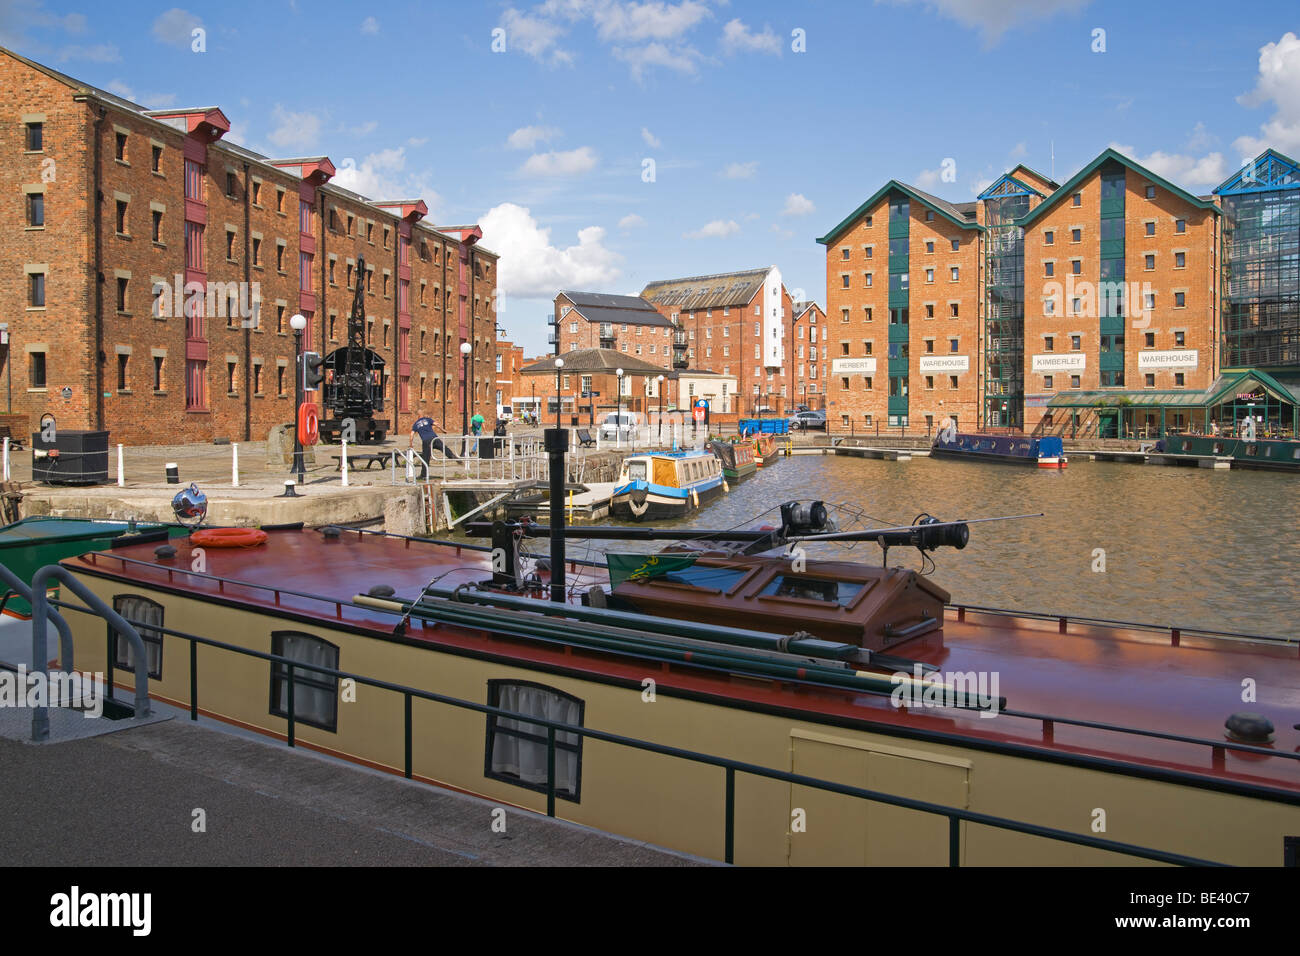 Gloucester docks, historic machinery, urban renewal, Gloucestershire, Cotswolds, England, July, 2009 - Stock Image